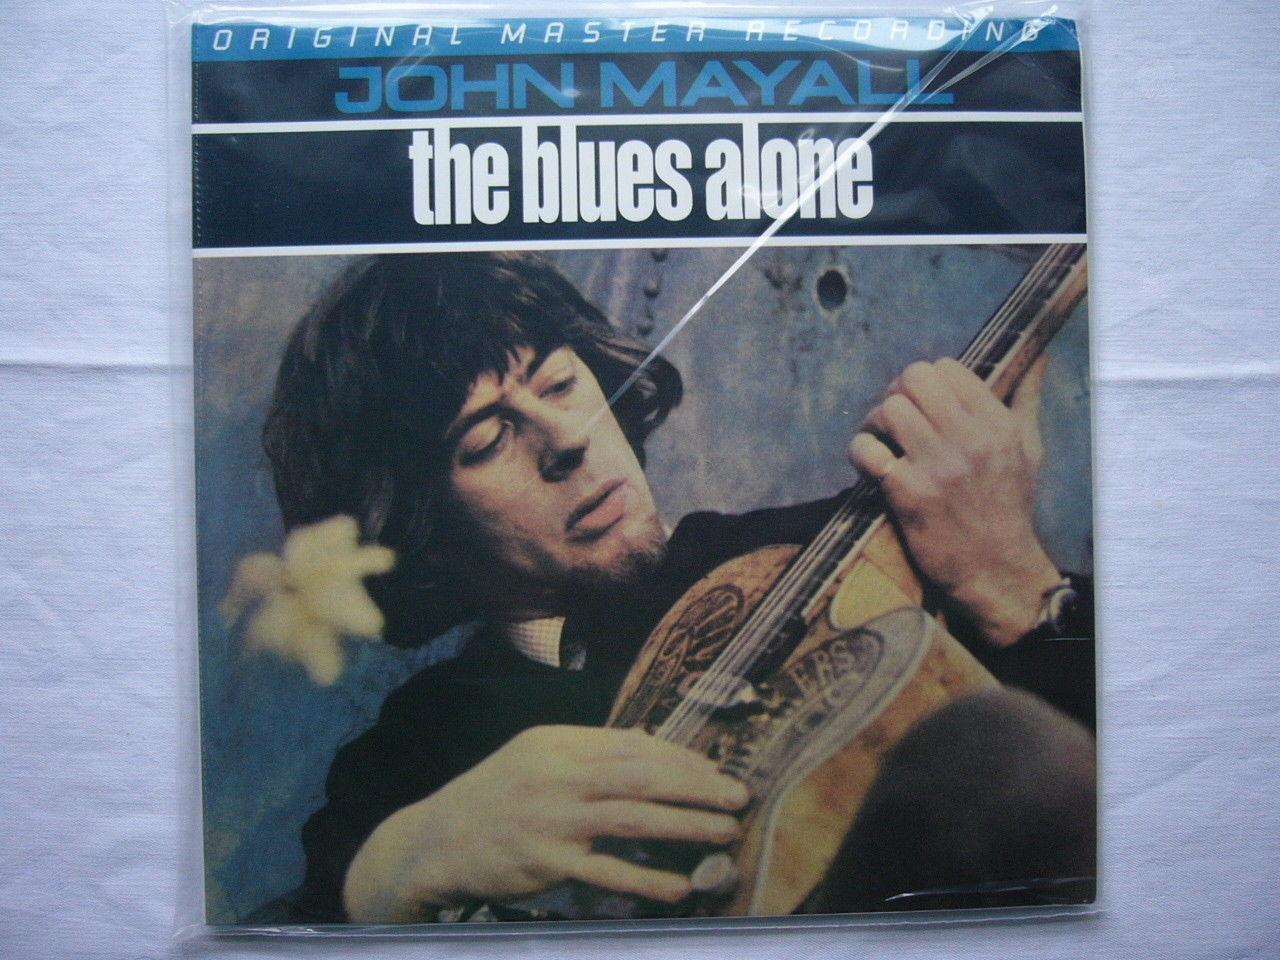 JOHN MAYALL THE BLUES ALONE MFSL MASTER RECORDING NEW SEALED FREE SHIPPING WORLD